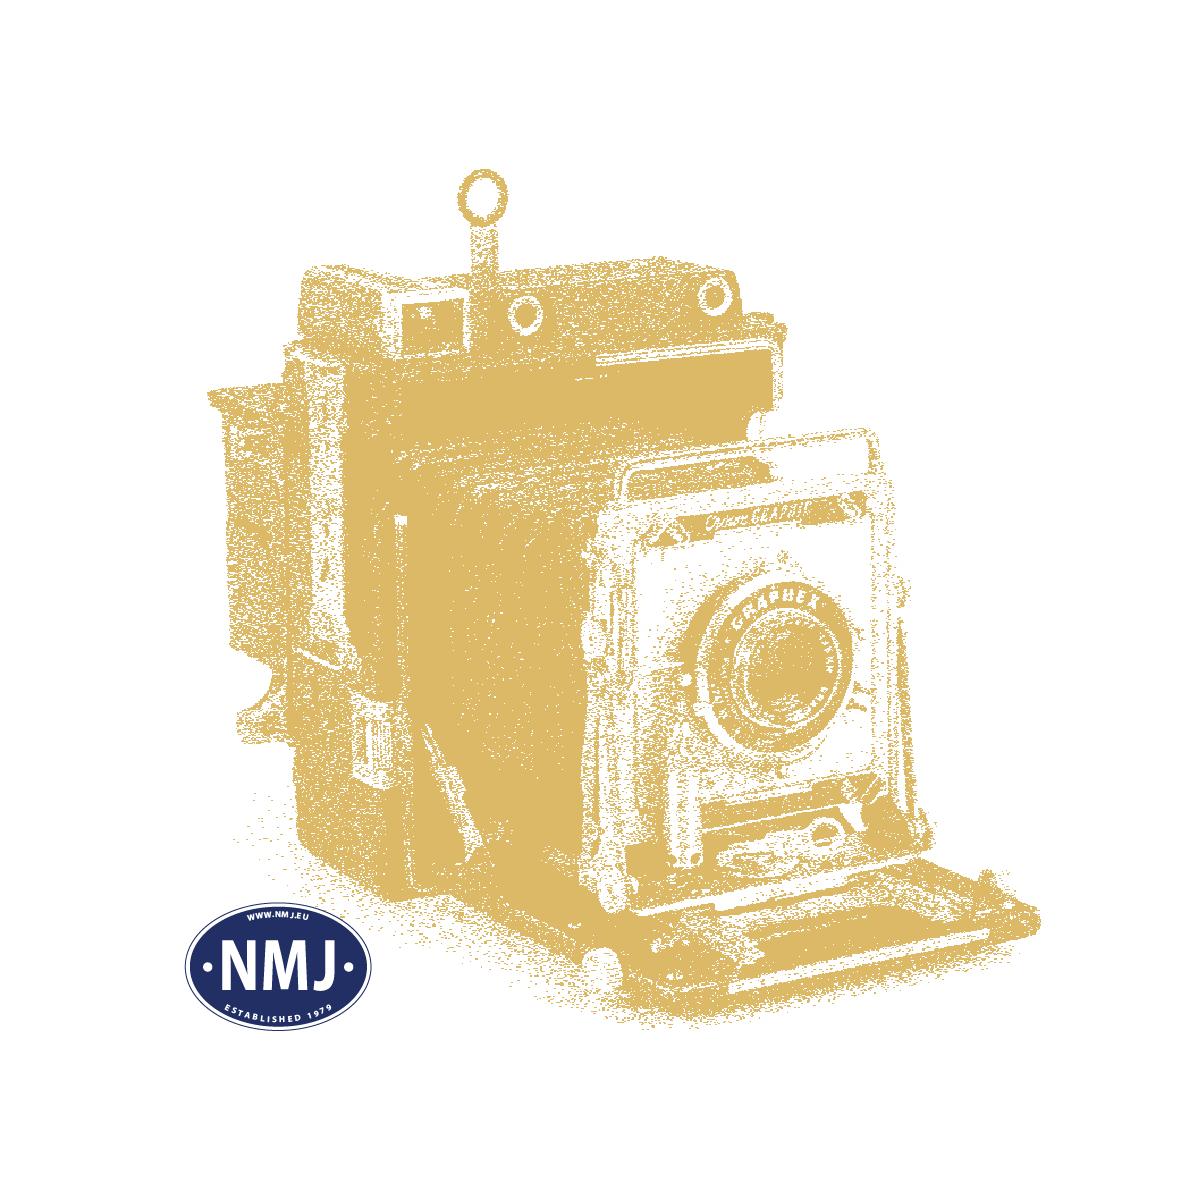 "NMJT90208 - NMJ Topline MAV M61.010, ""NMJ Spezial"", DC"